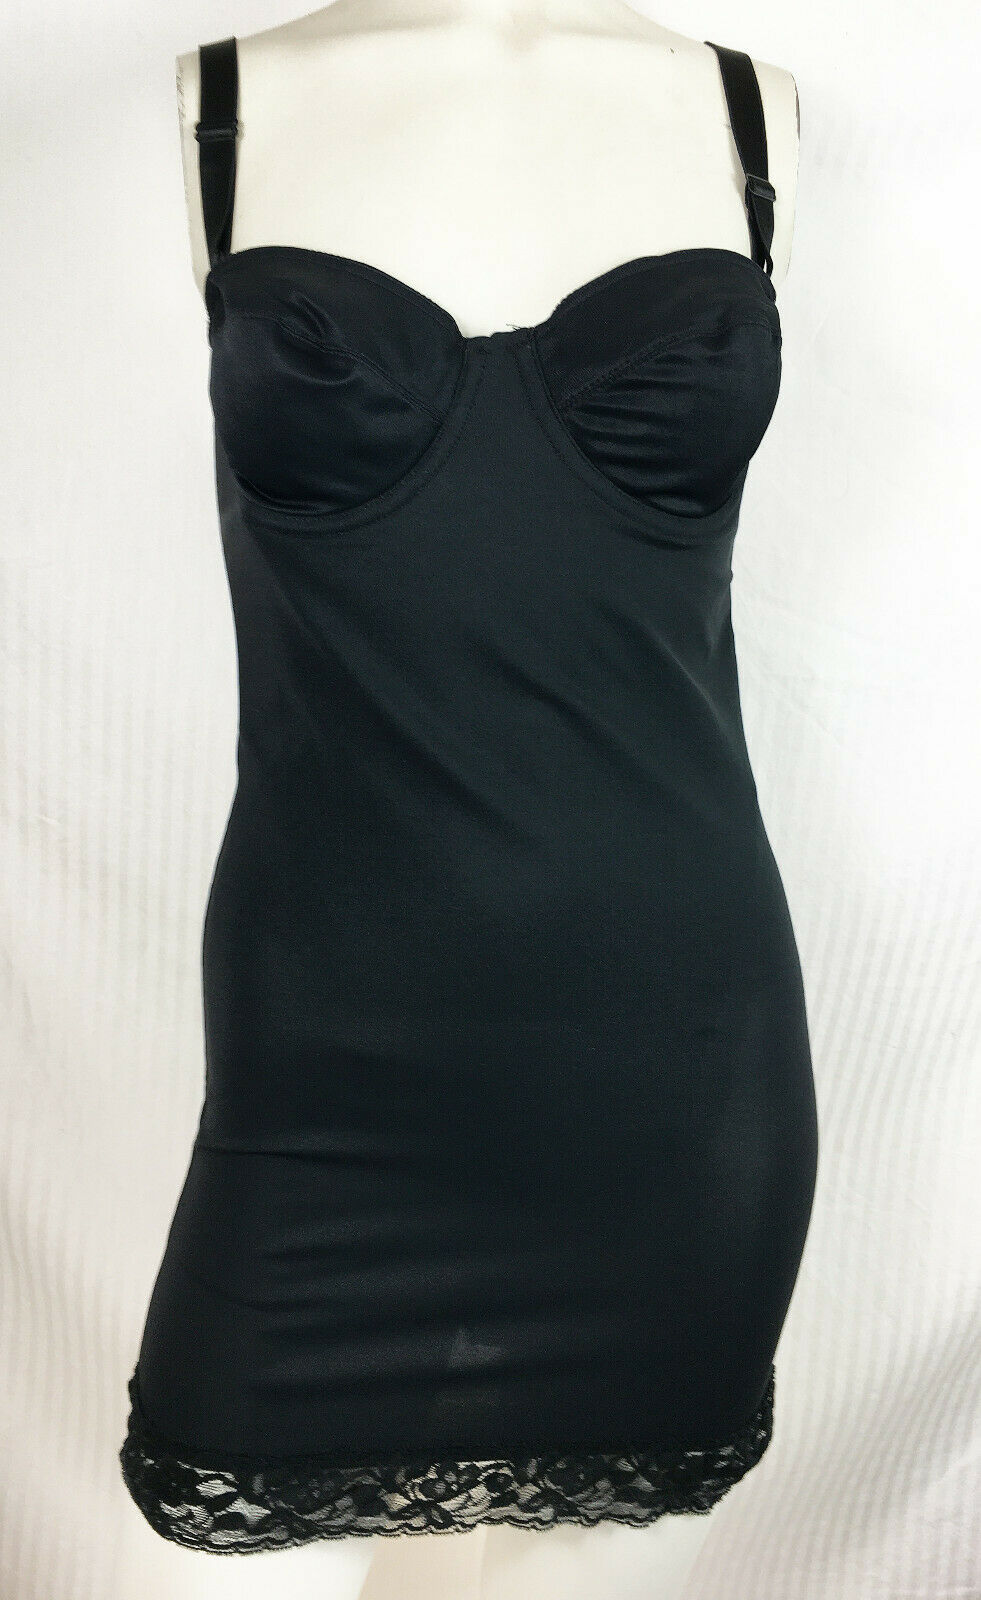 90s Nancy Ganz Bust Boosting Body Slip / Dress Un… - image 2